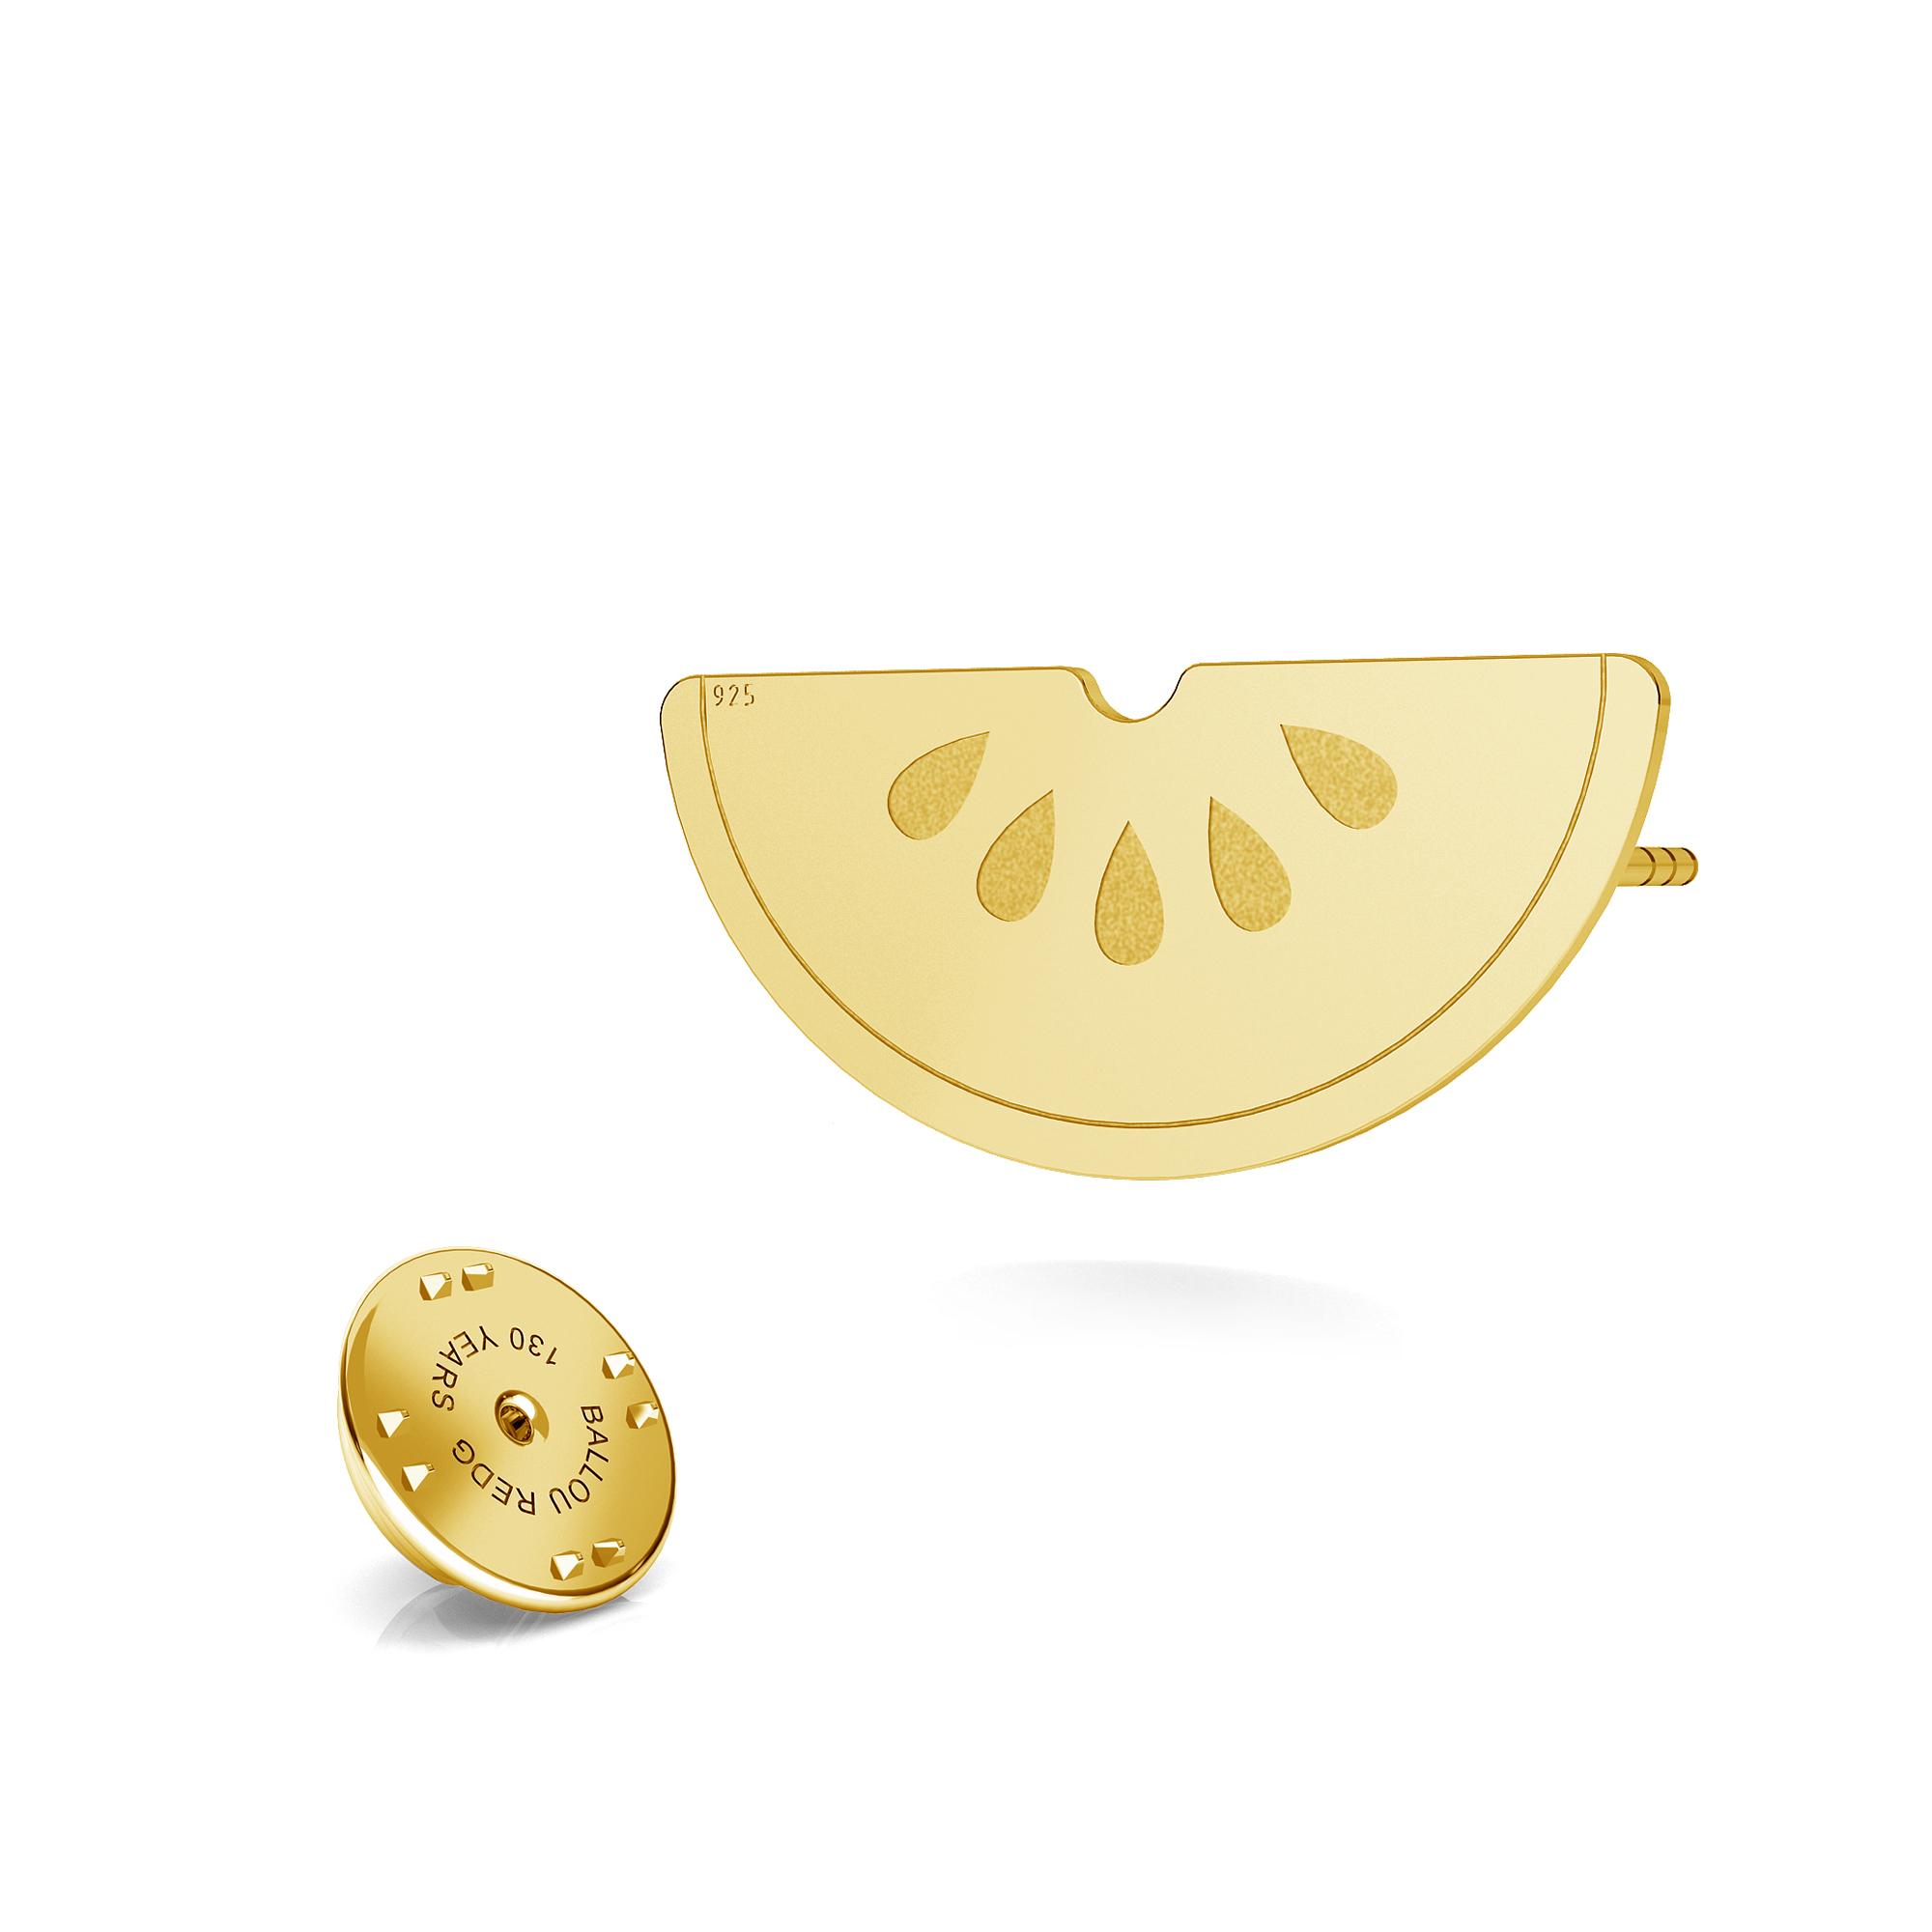 Pineapple lapel pin 925 - ARÔME